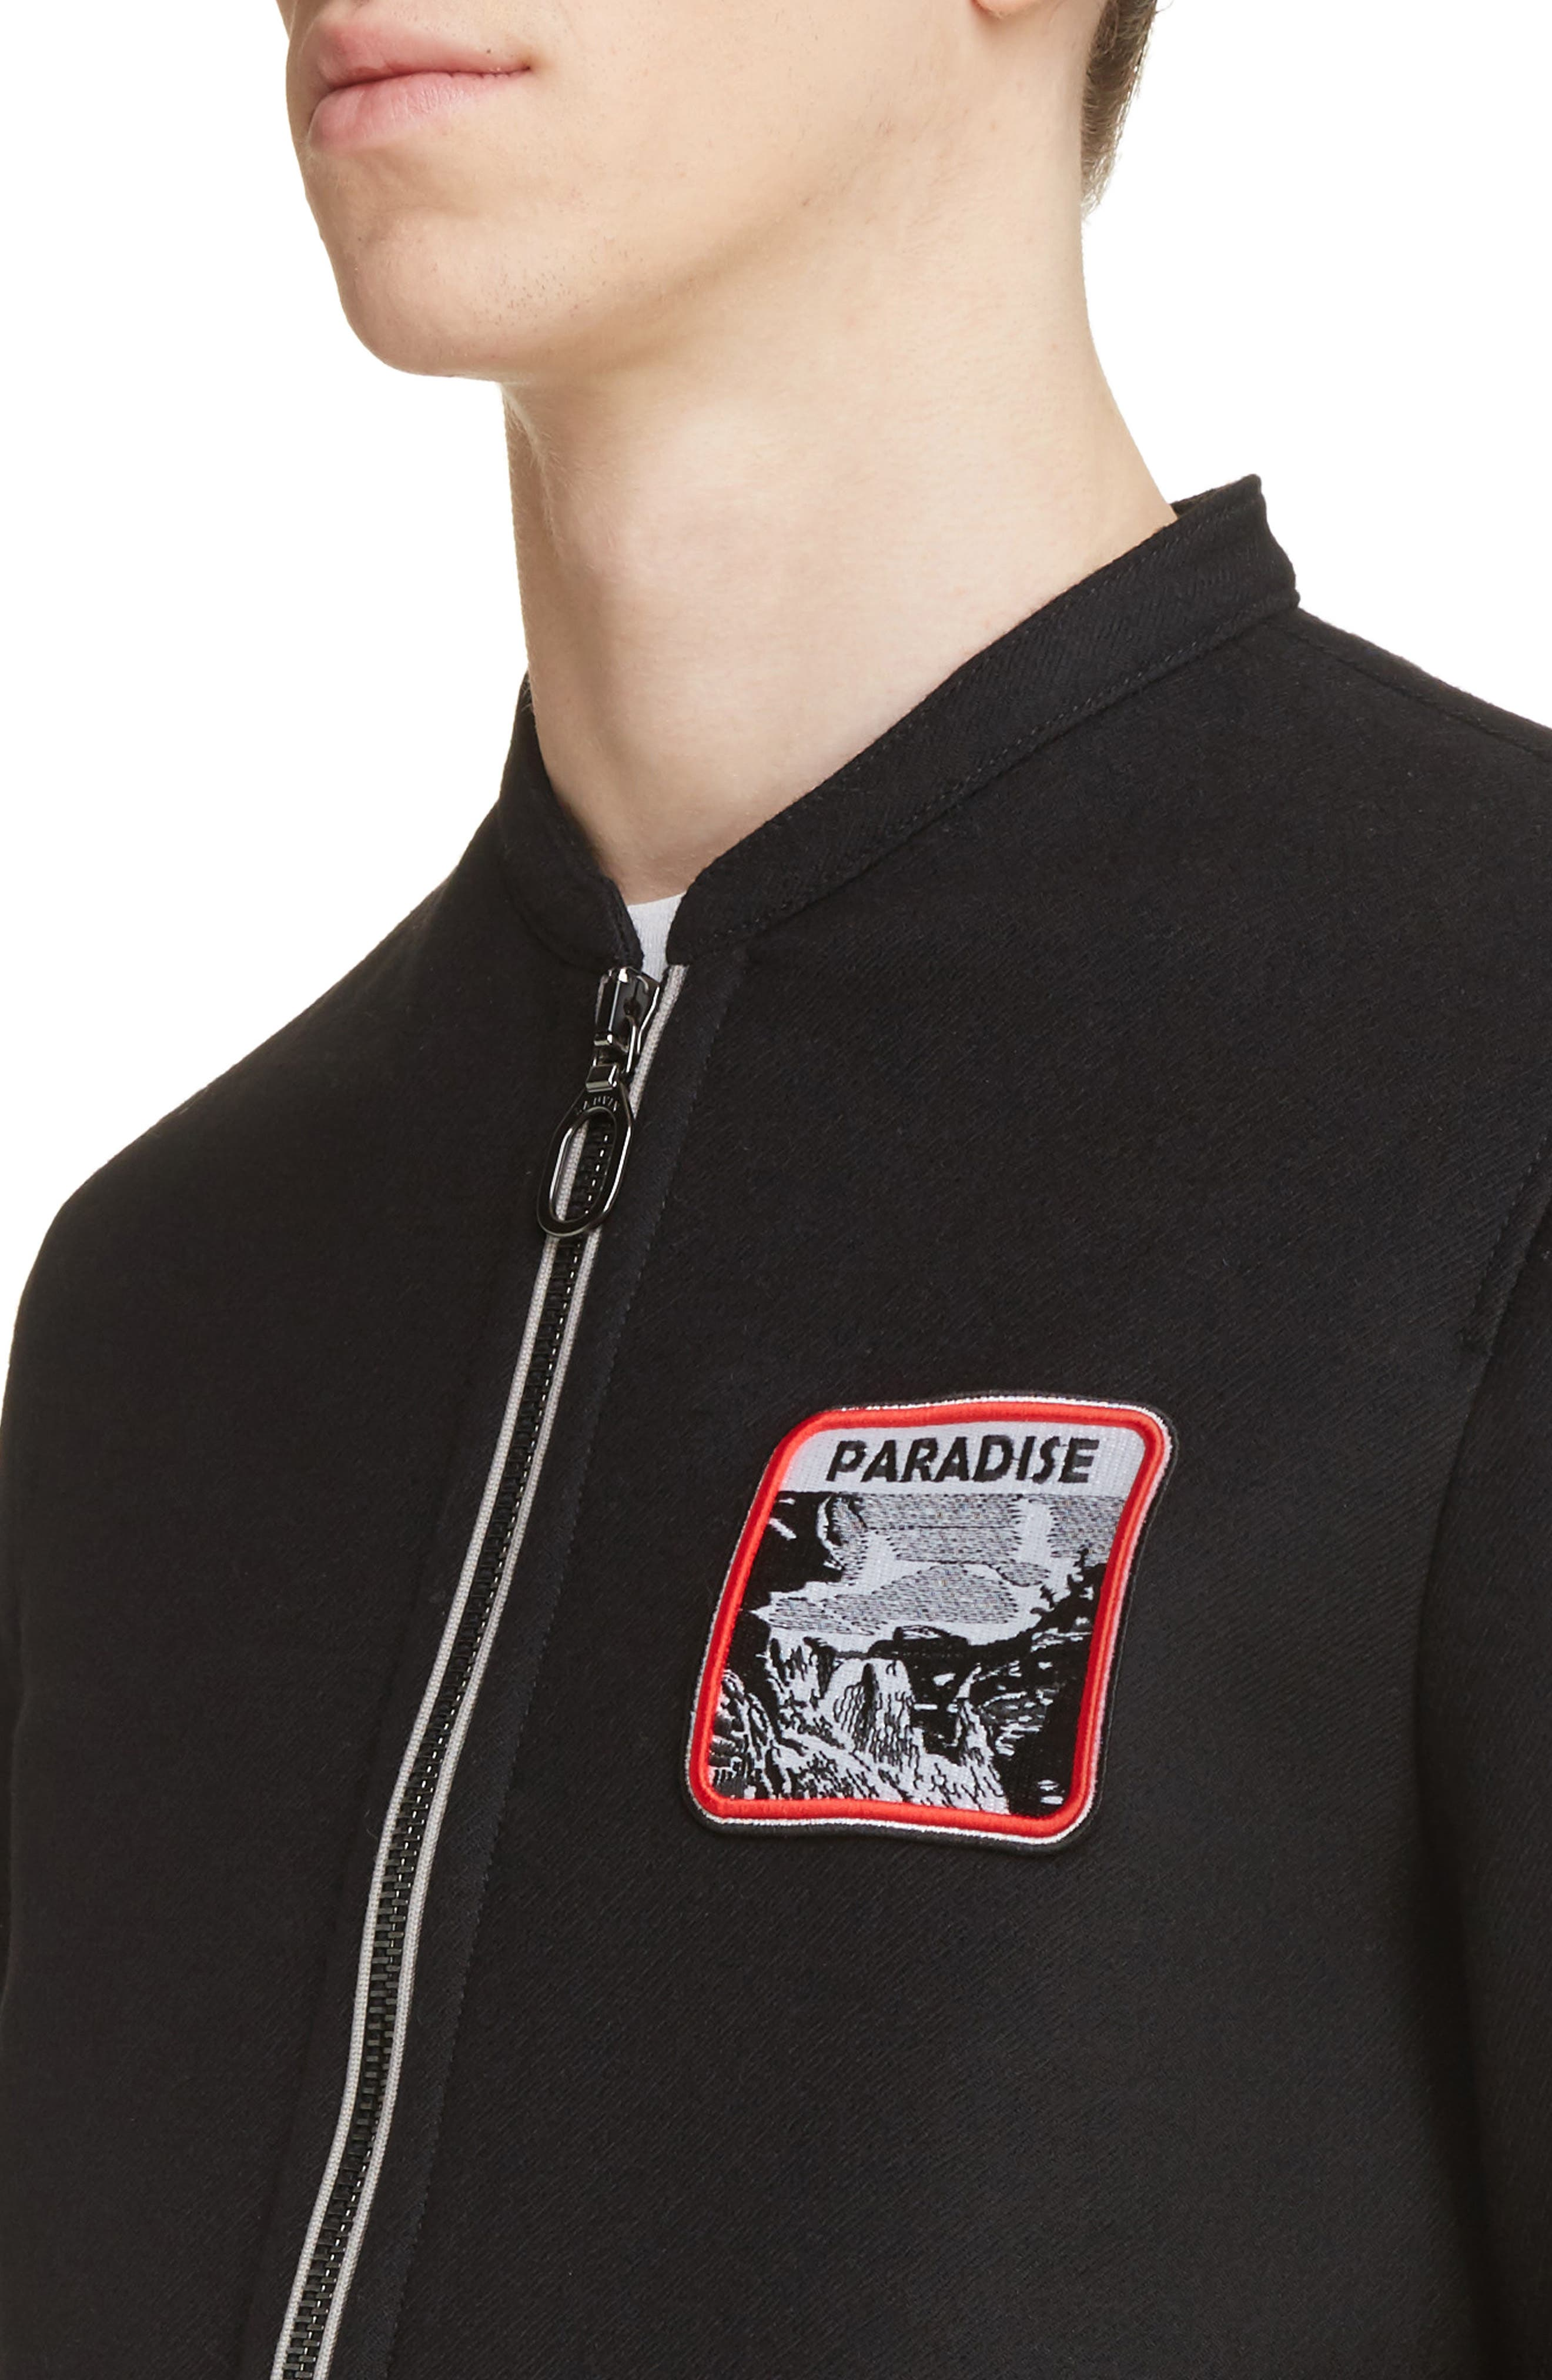 Paradise Patch Bomber Jacket,                             Alternate thumbnail 4, color,                             001